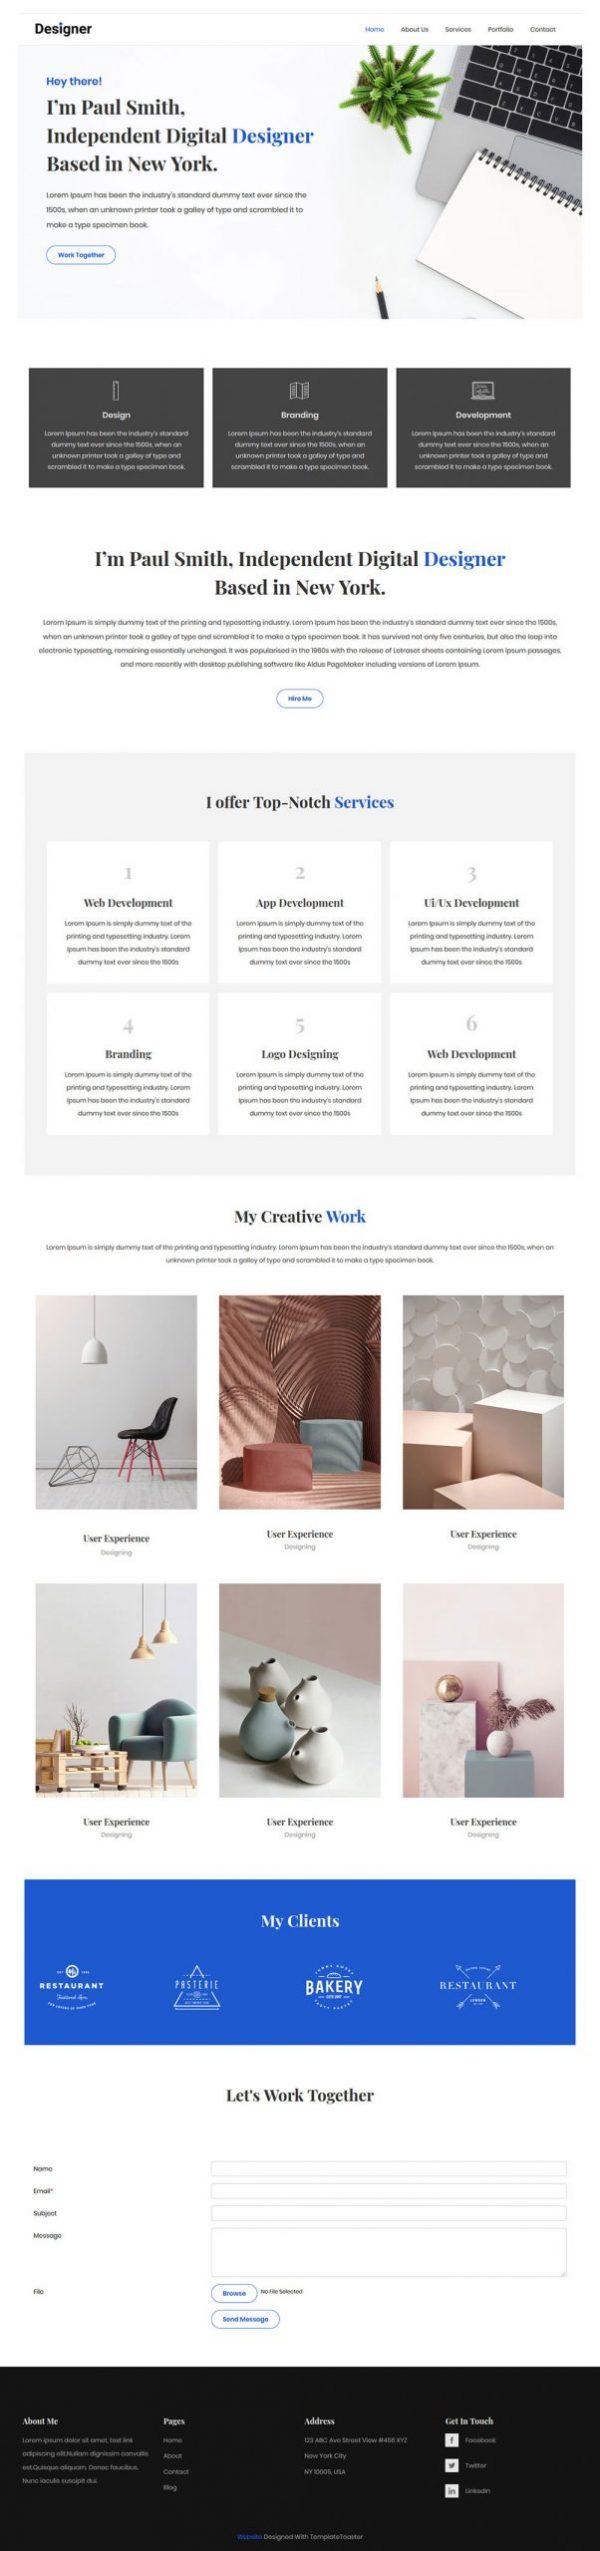 single page designer portfolio html template